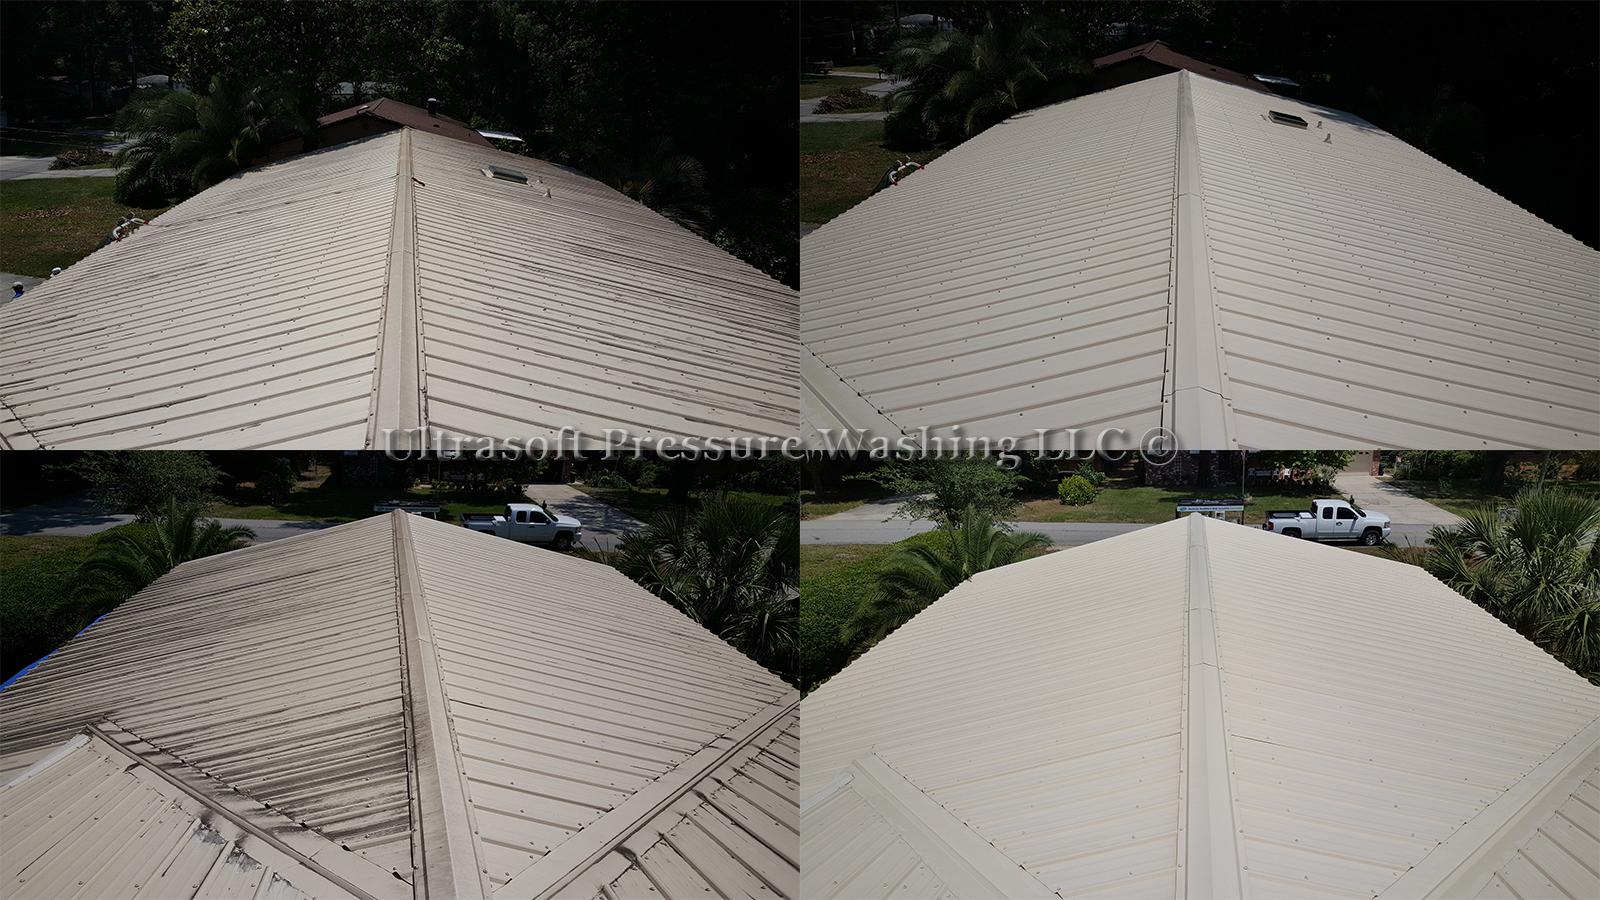 Elegant Metal Roof Cleaning Jacksonville Fl.thum